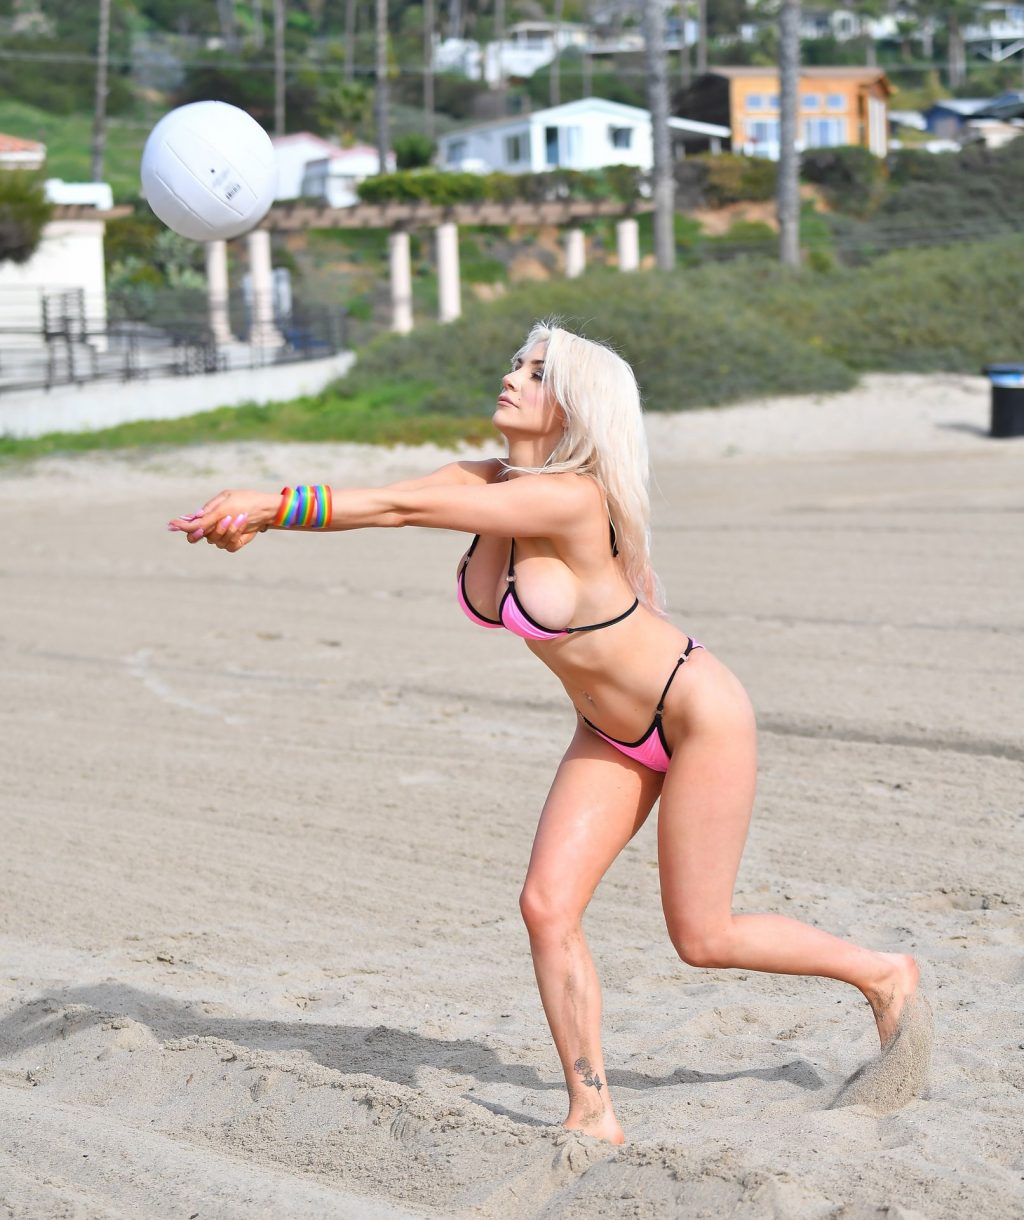 Busty Courtney Stodden Poses on the Beach in Santa Monica (24 Photos)